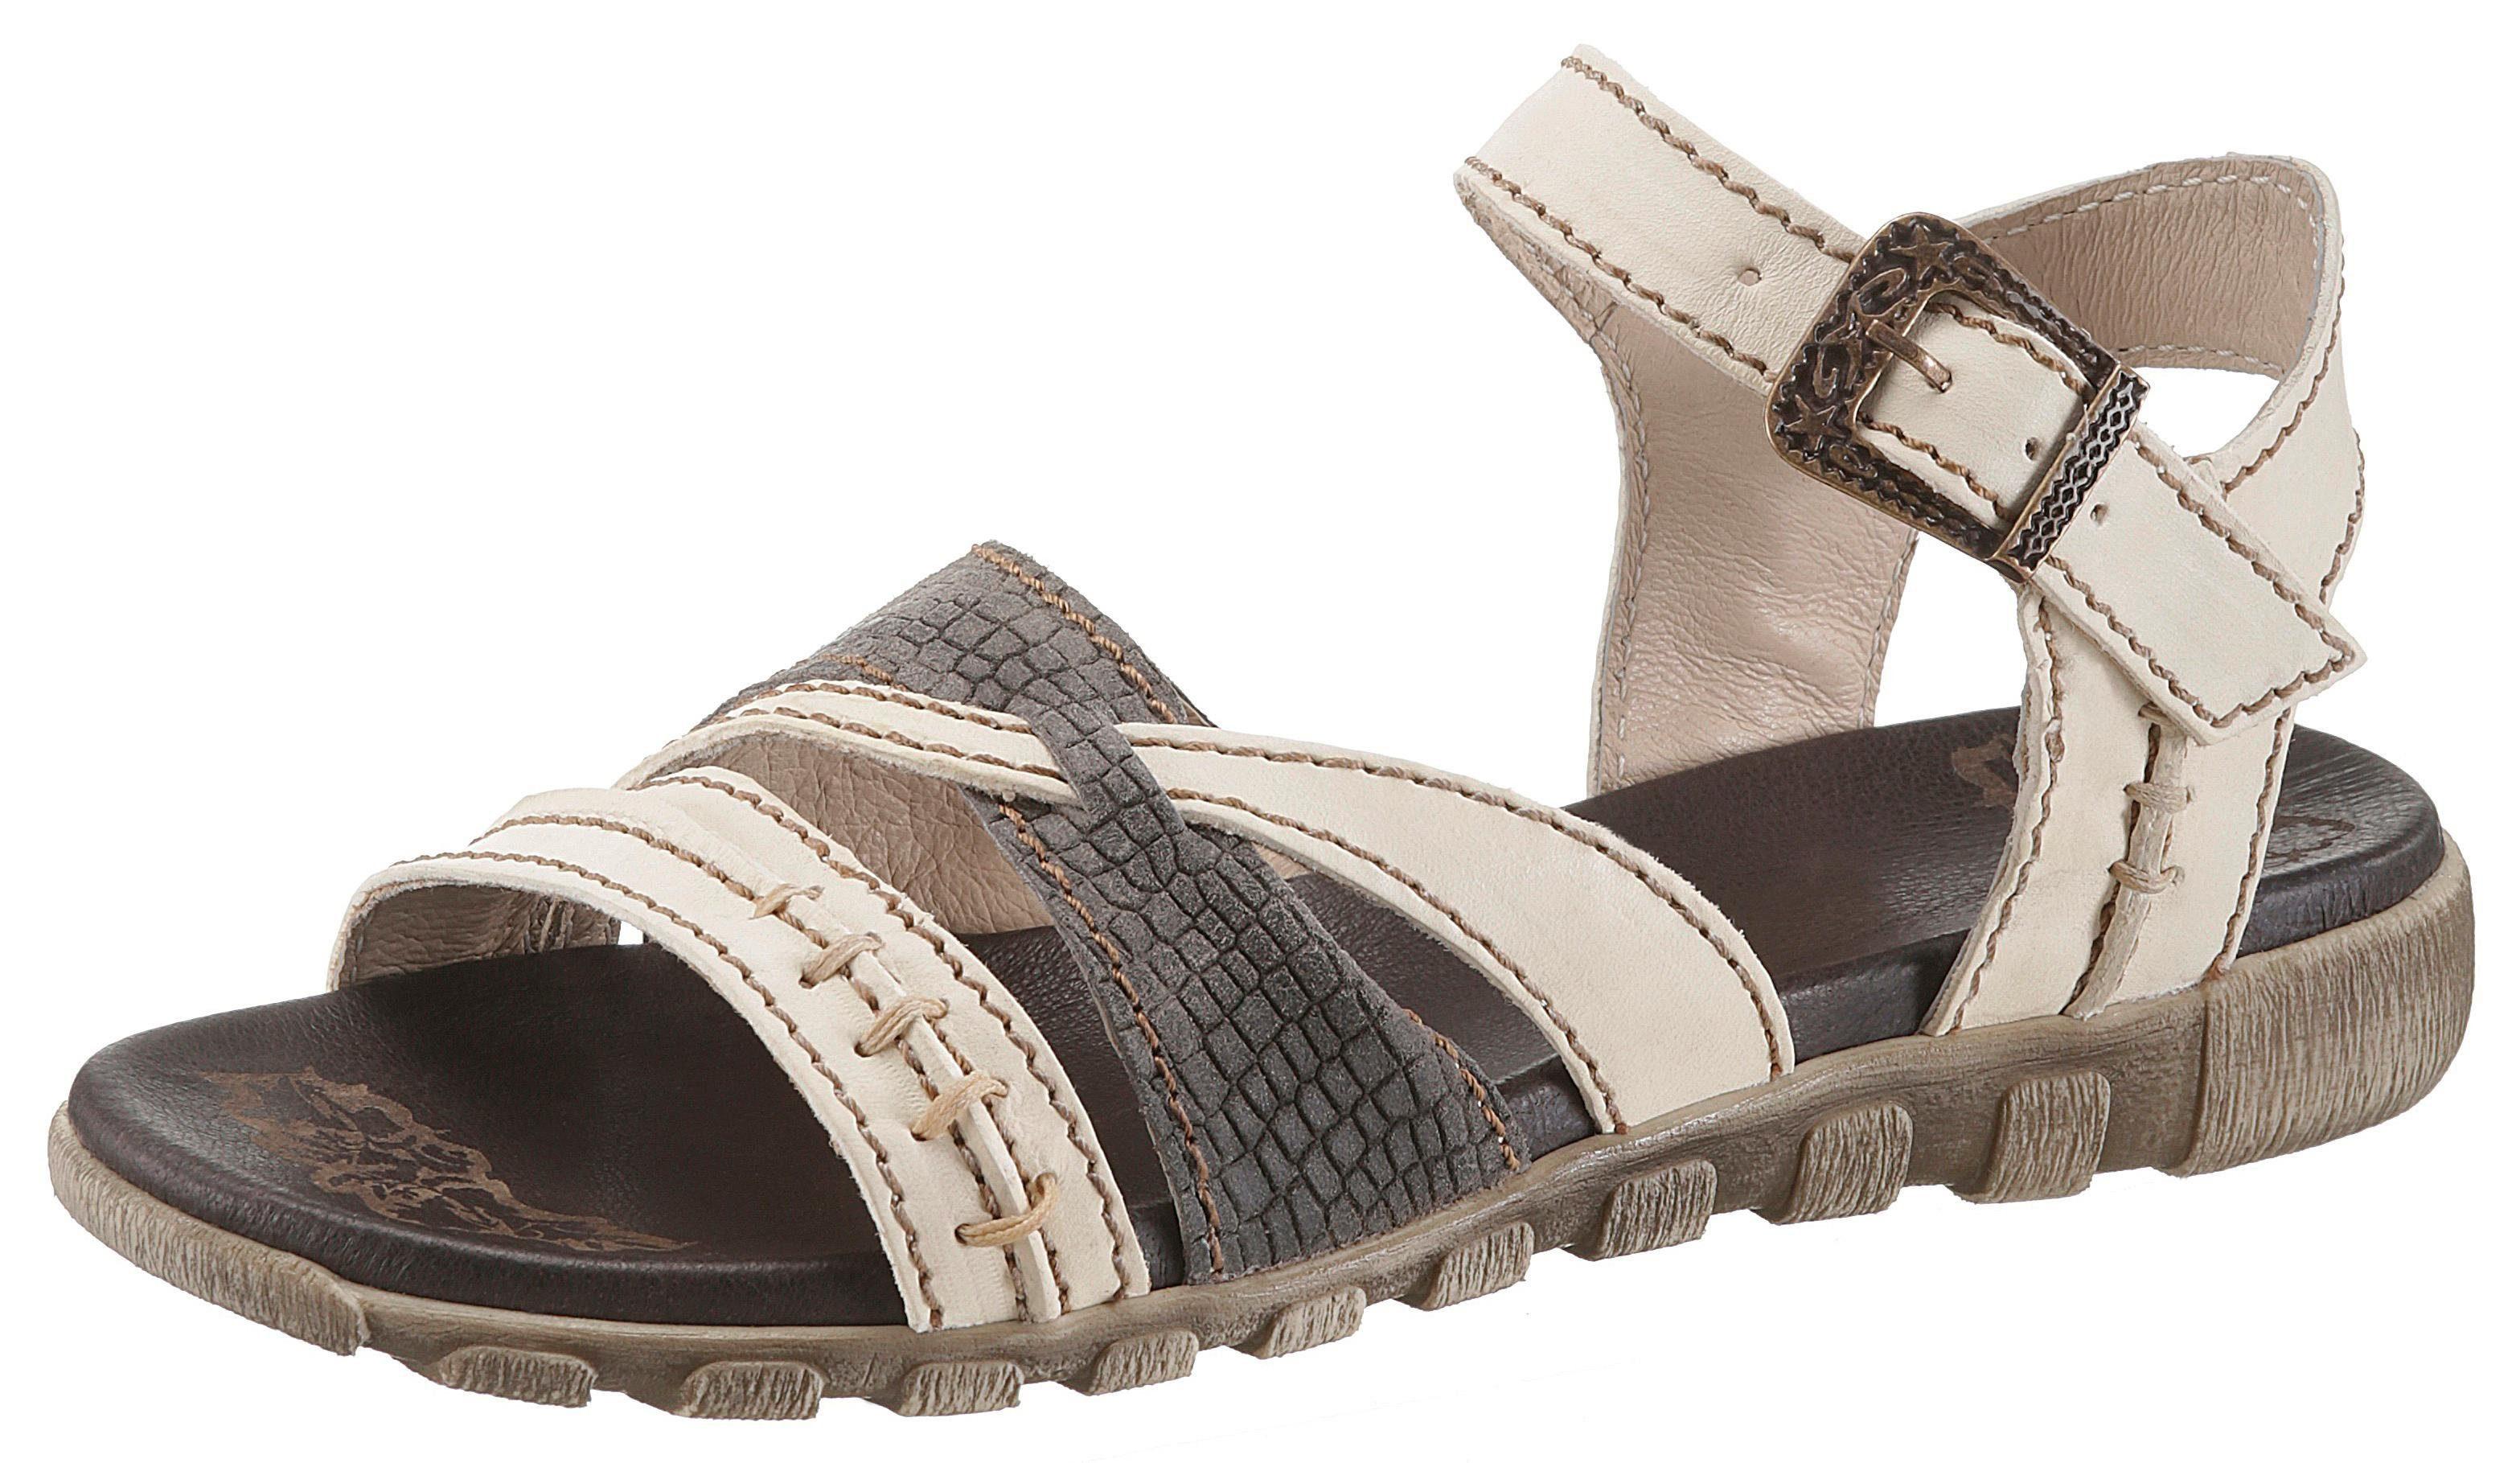 Rovers Sandale, im sportiven Design online kaufen  offwhite-grau